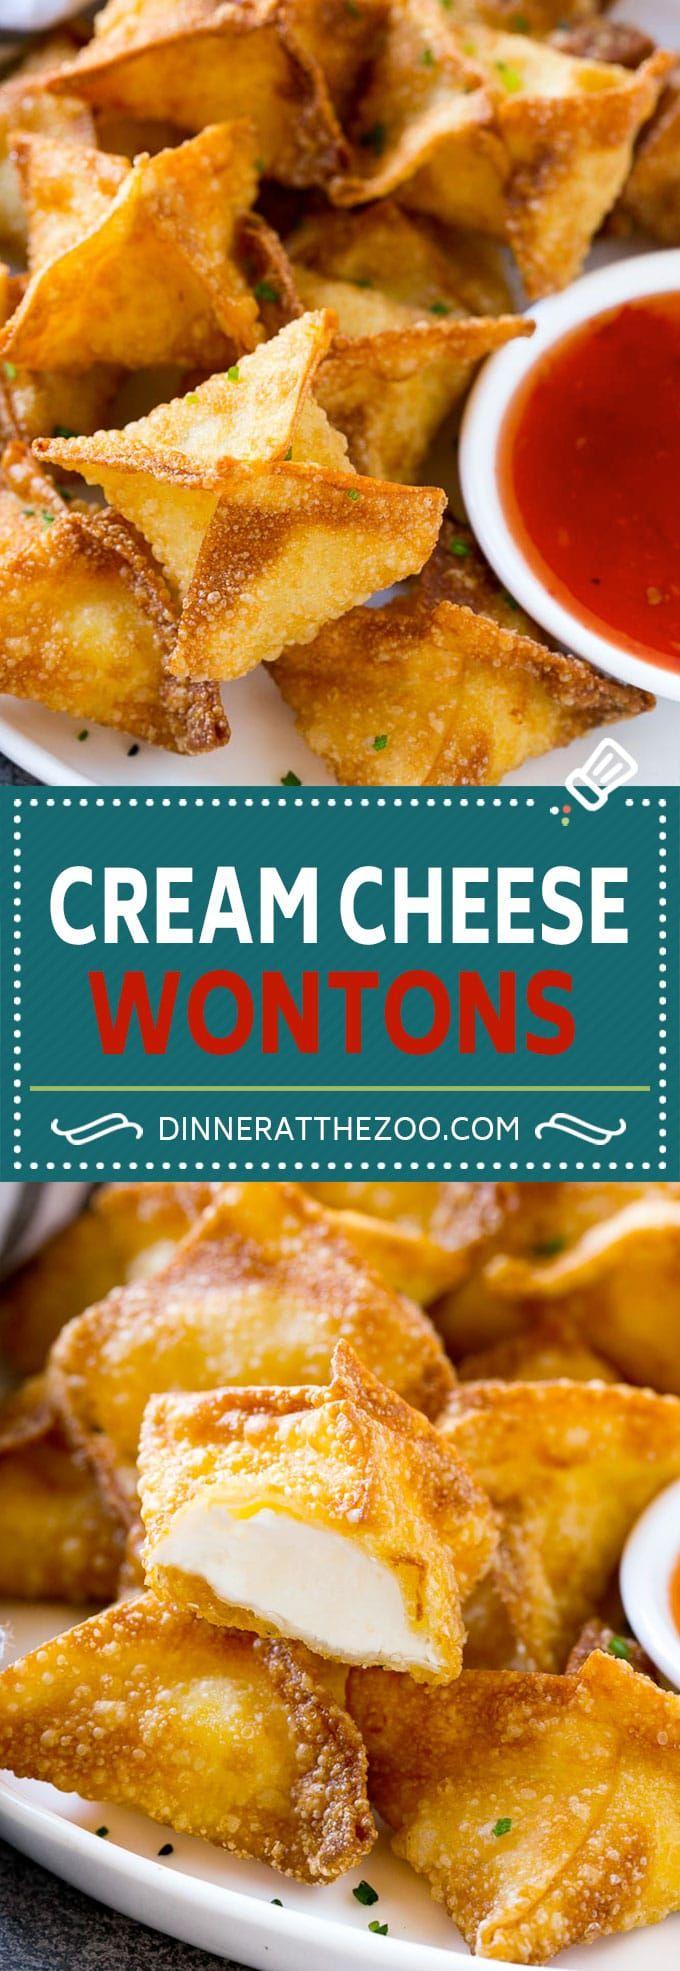 Cream Cheese Wontons Recipe | Cream Cheese Rangoon | Wonton Appetizer